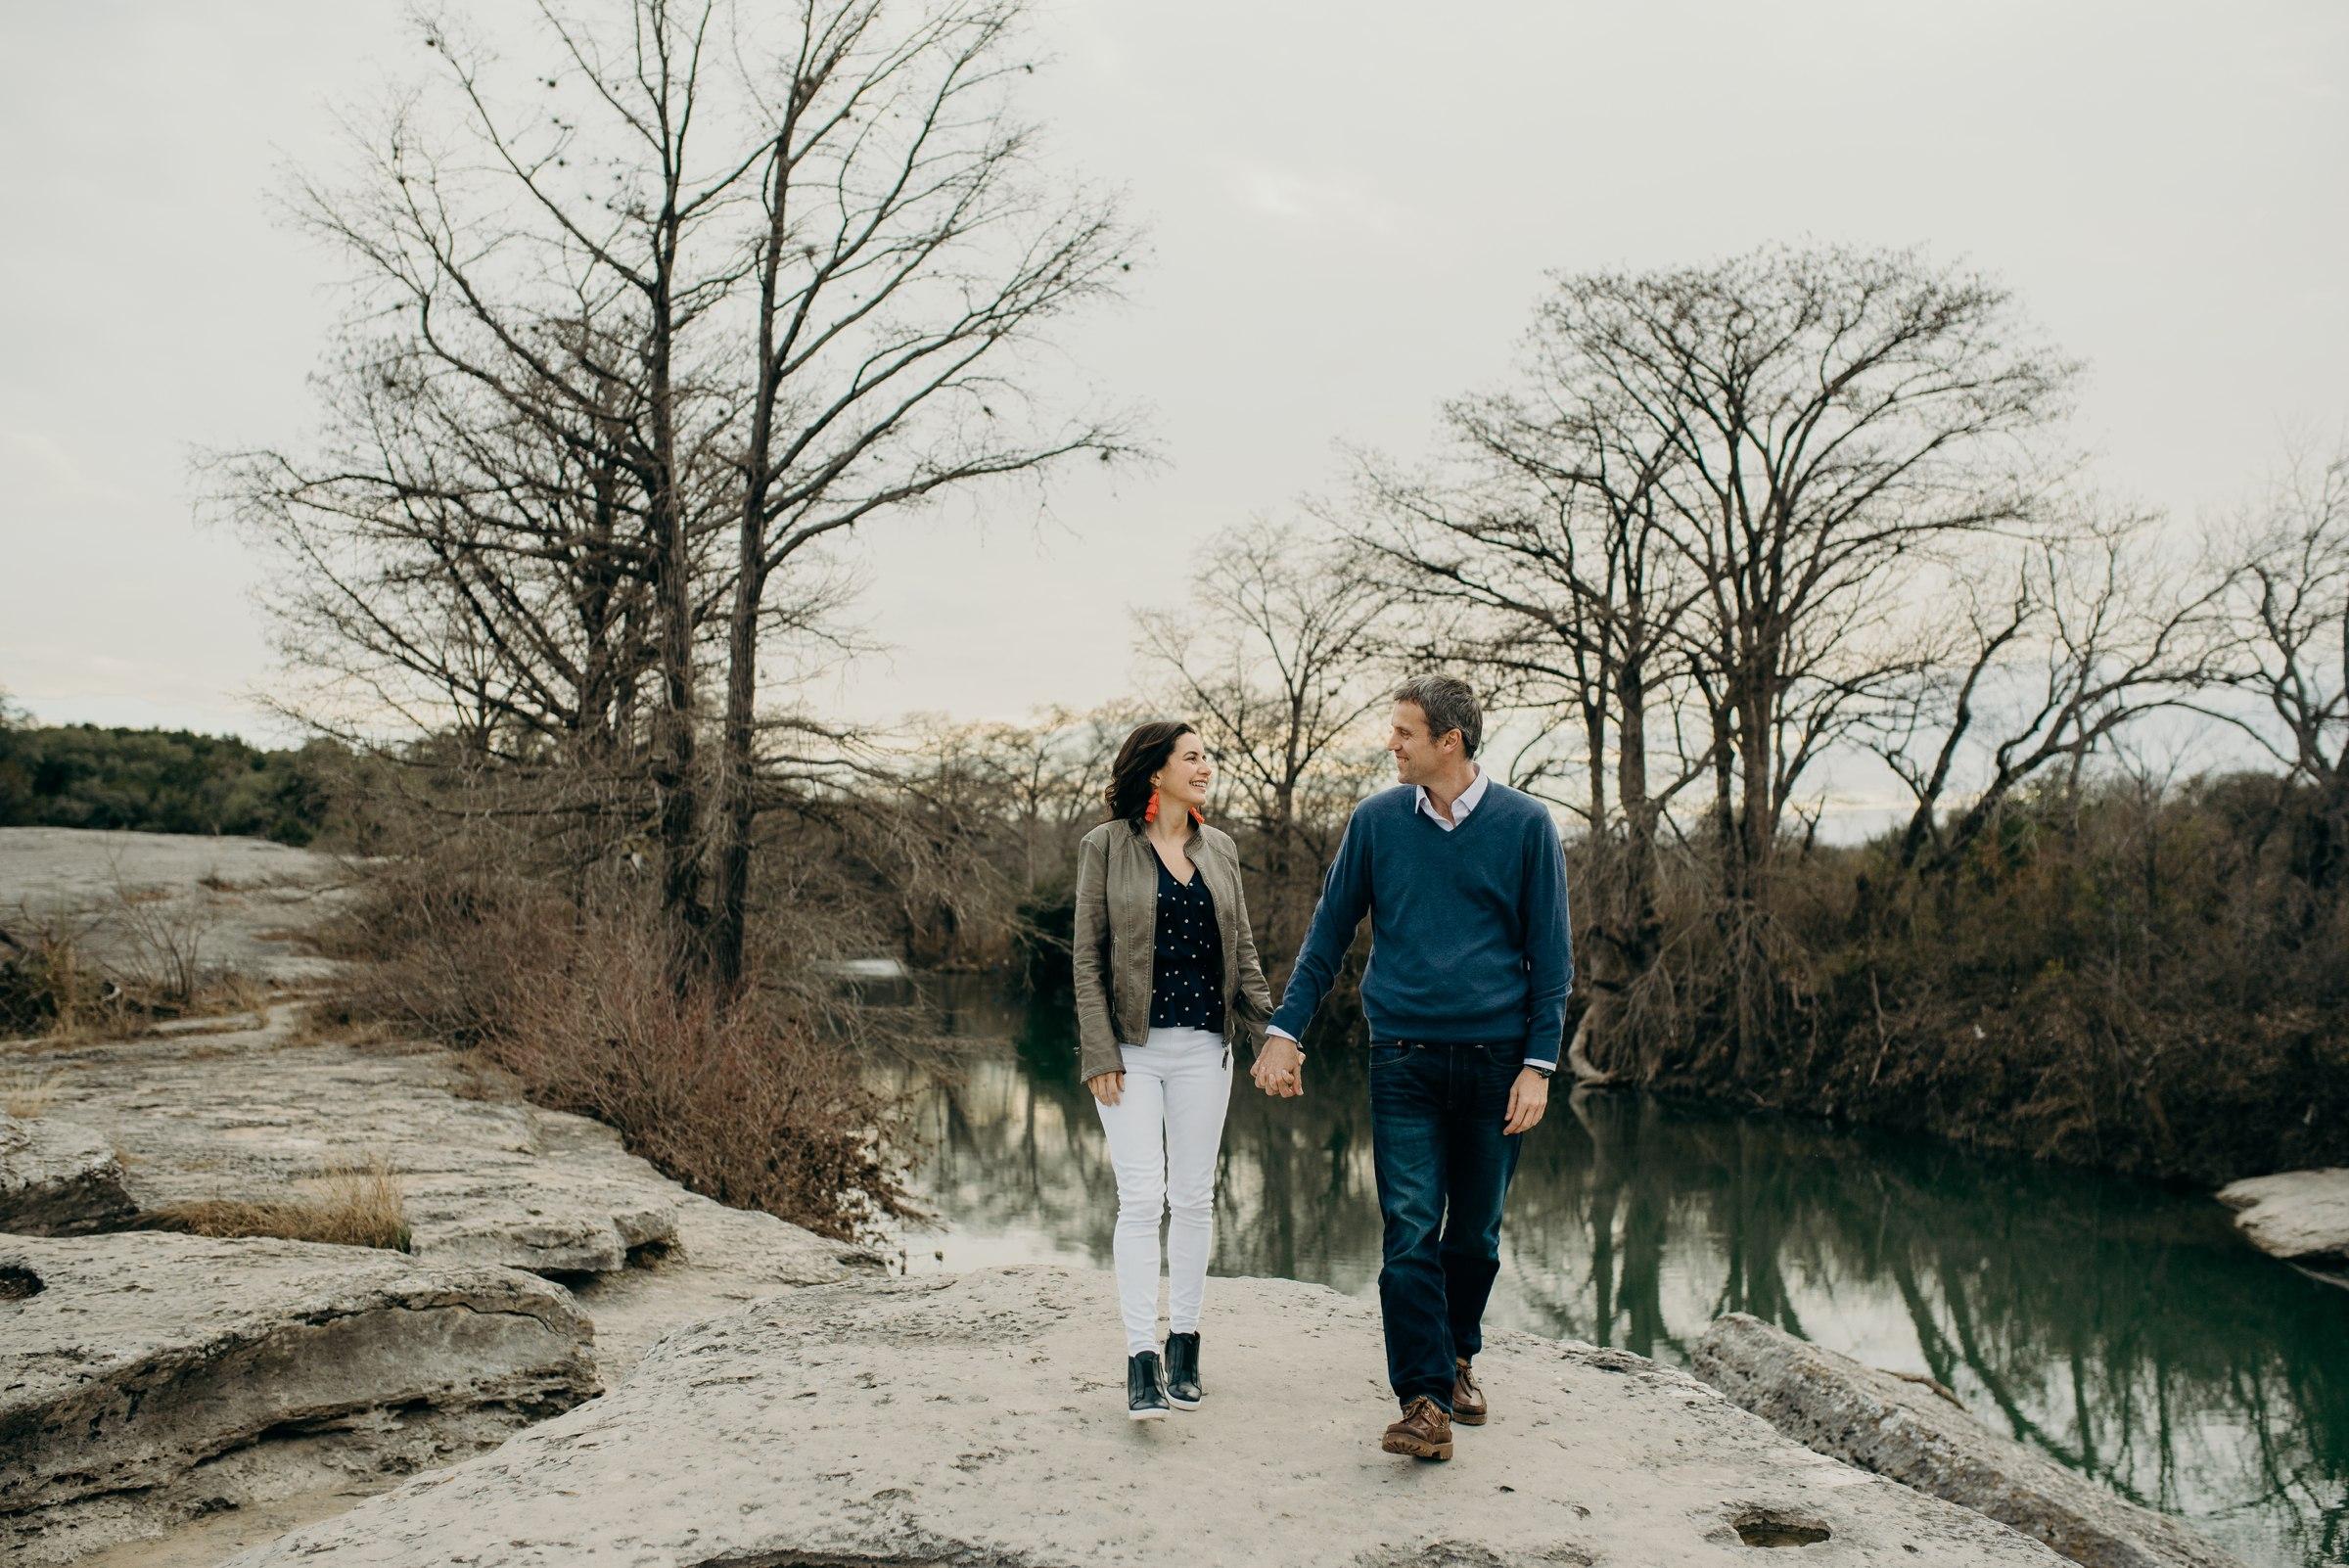 austin-mckinney-falls-engagement-photographer-elopement-prices-best-headshot-senior-adventurous-italy-minneapolis-texas-minnesota-dallas-houston-tulum-mexico_0039.jpg